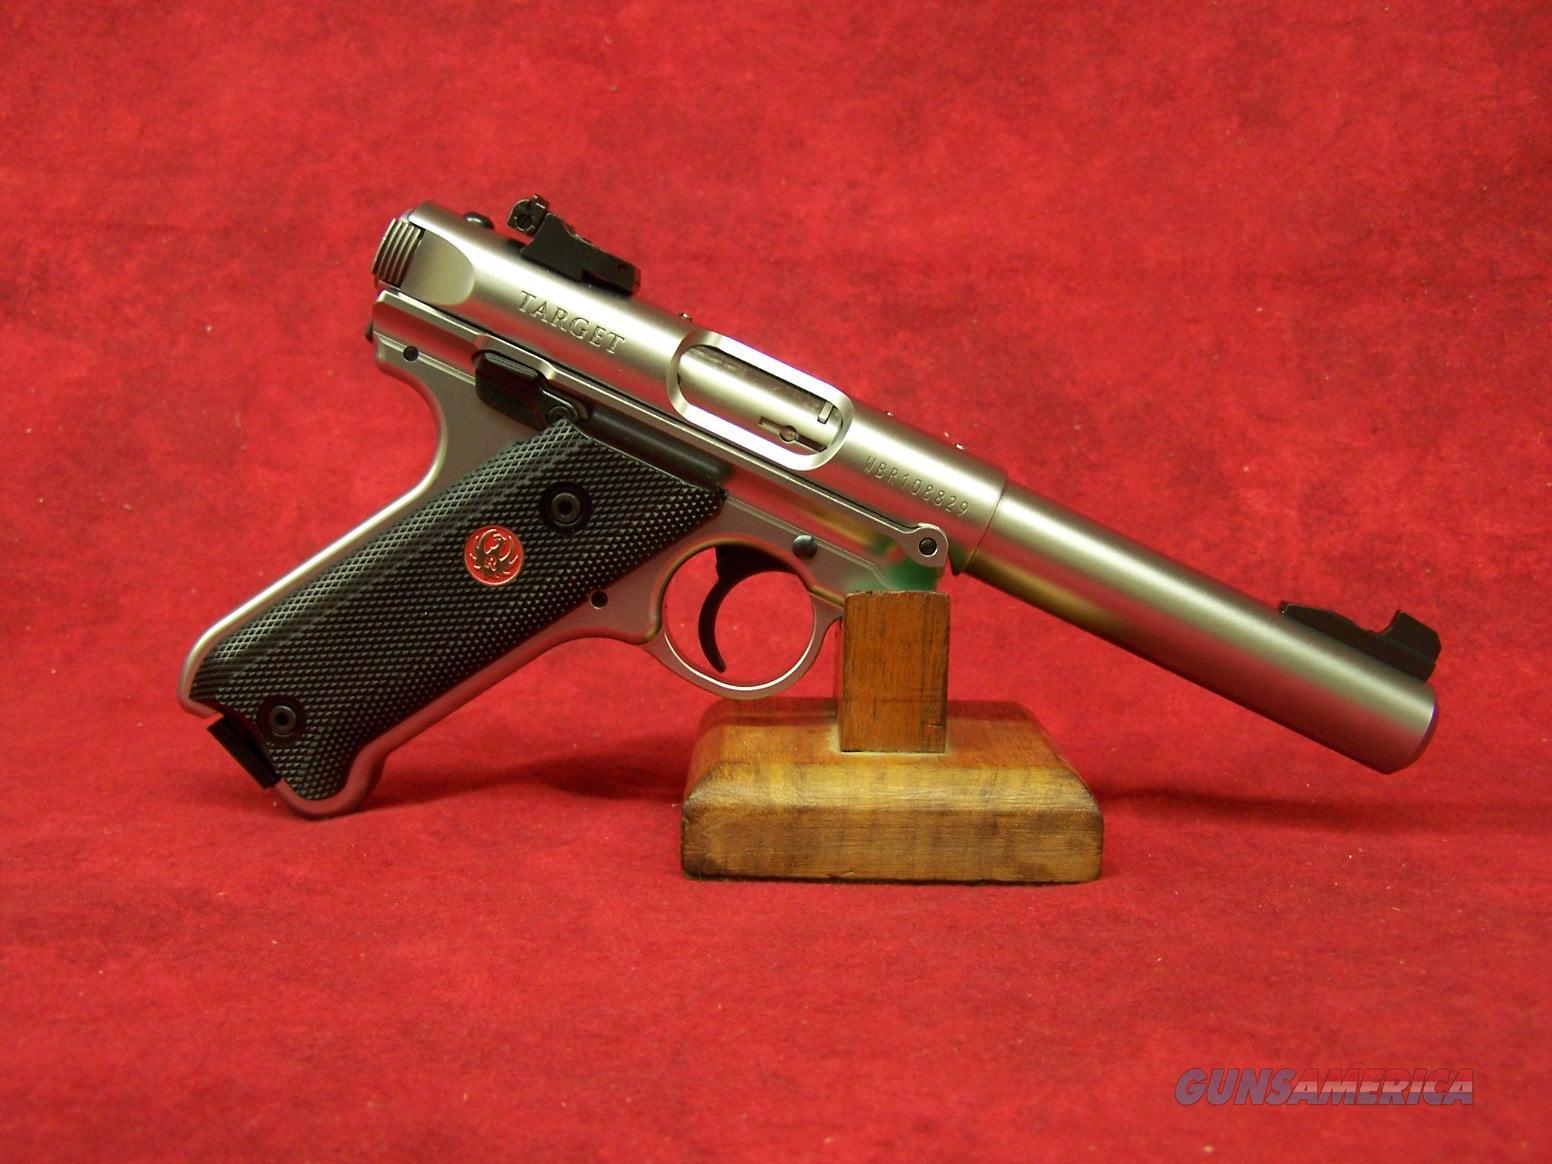 "RUGER MKIV TARGET 22LR 5.5"" BULL SS AS 2 10RD (40103)  Guns > Pistols > Ruger Semi-Auto Pistols > Mark I/II/III Family"